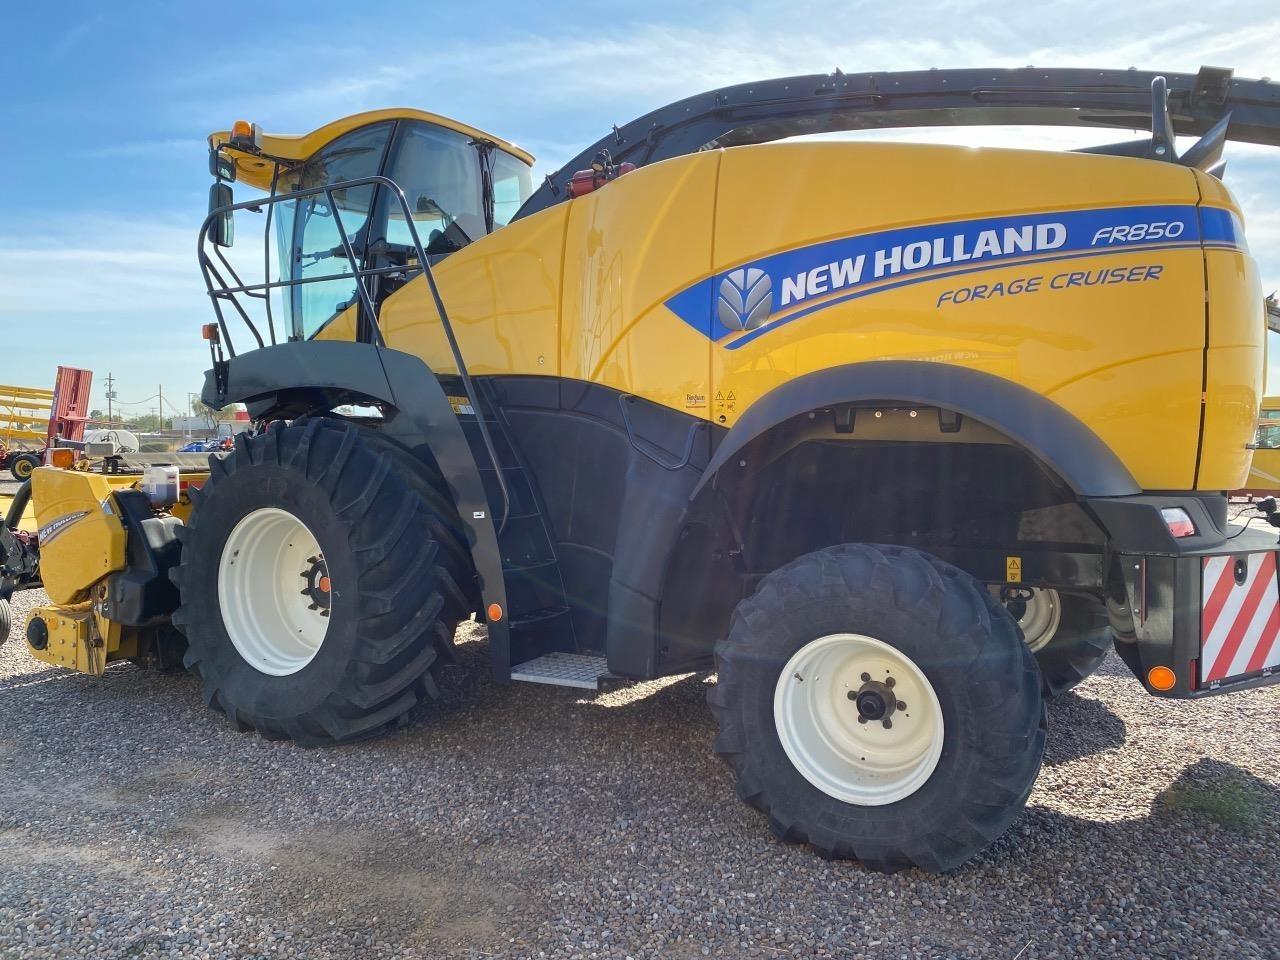 2017 New Holland FR850 Self-Propelled Forage Harvester